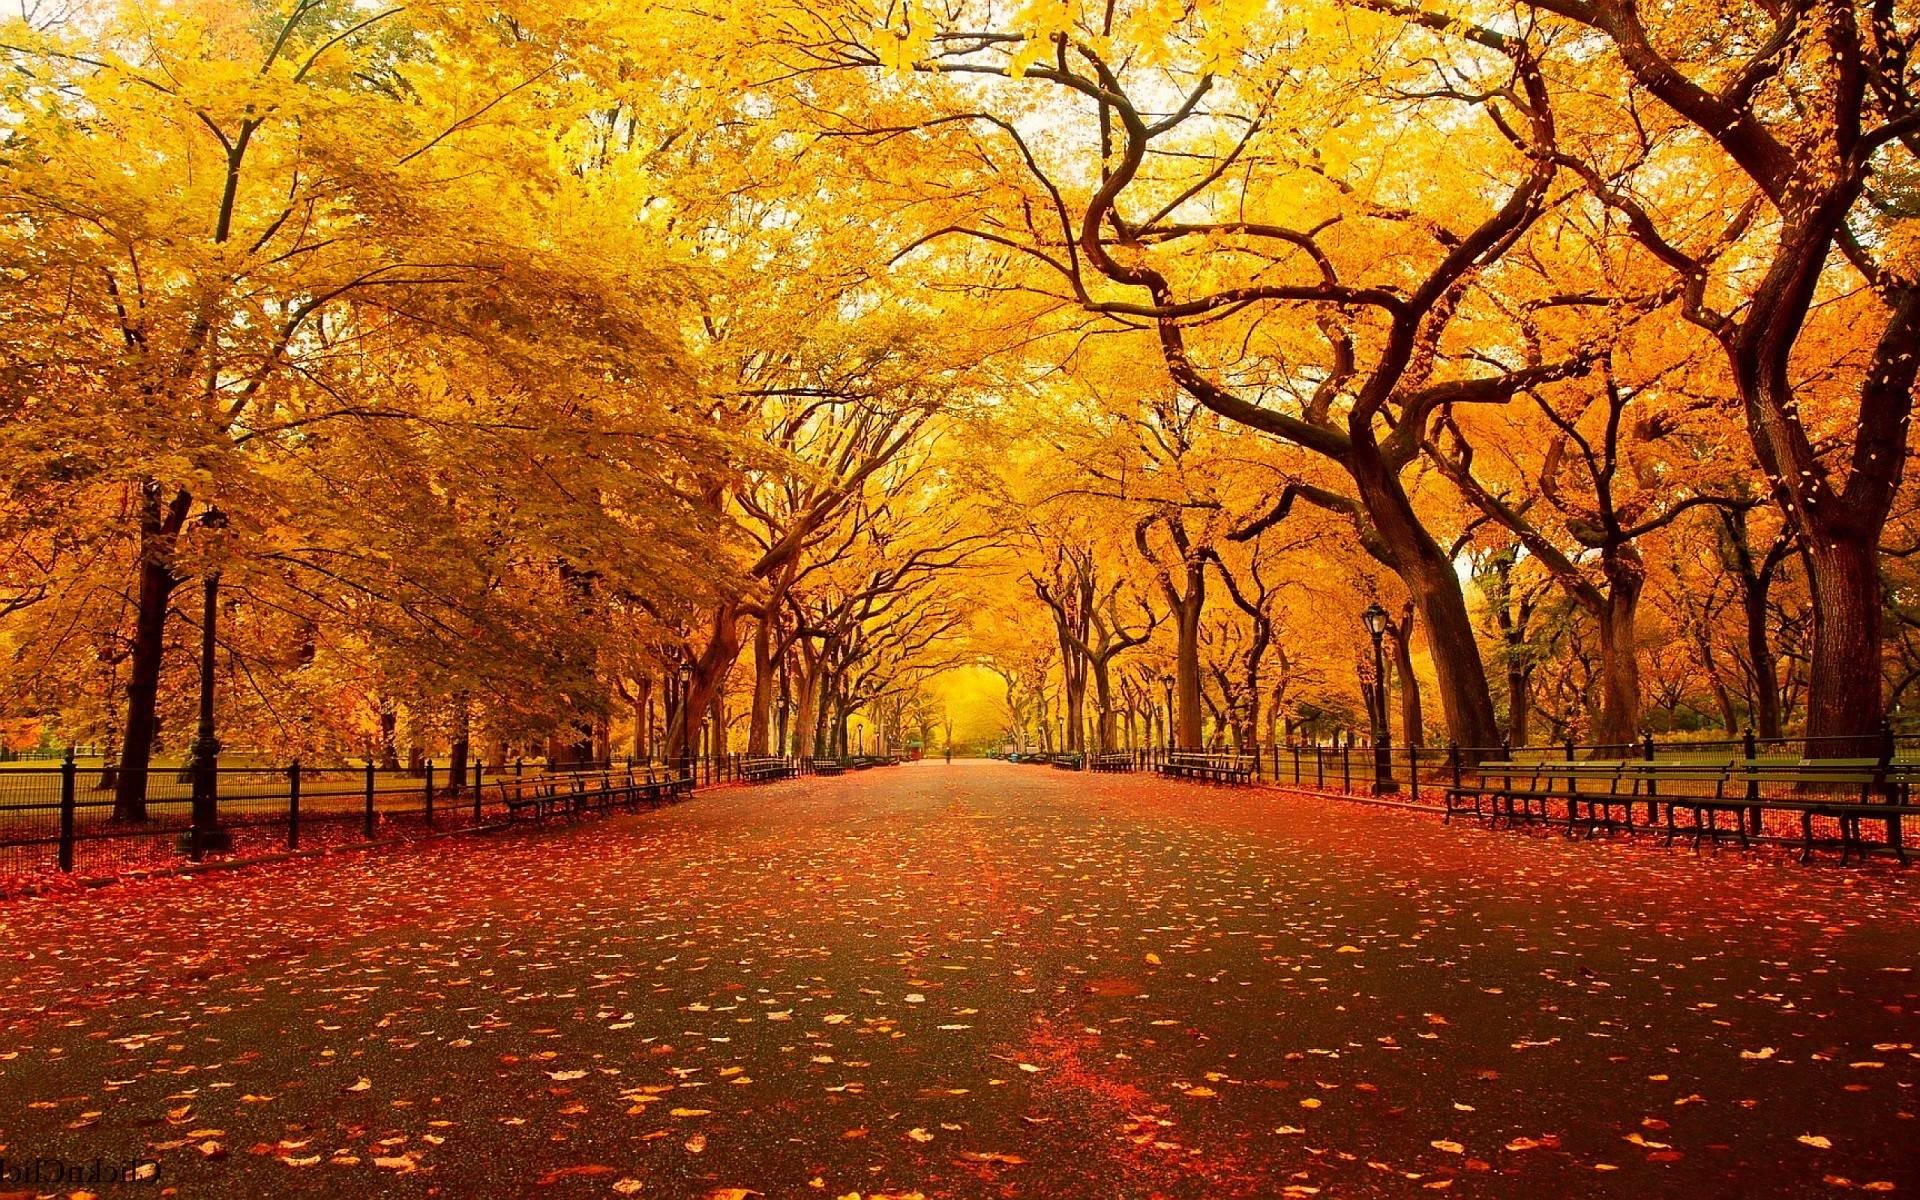 Christian Autumn Wallpaper (36+ Images